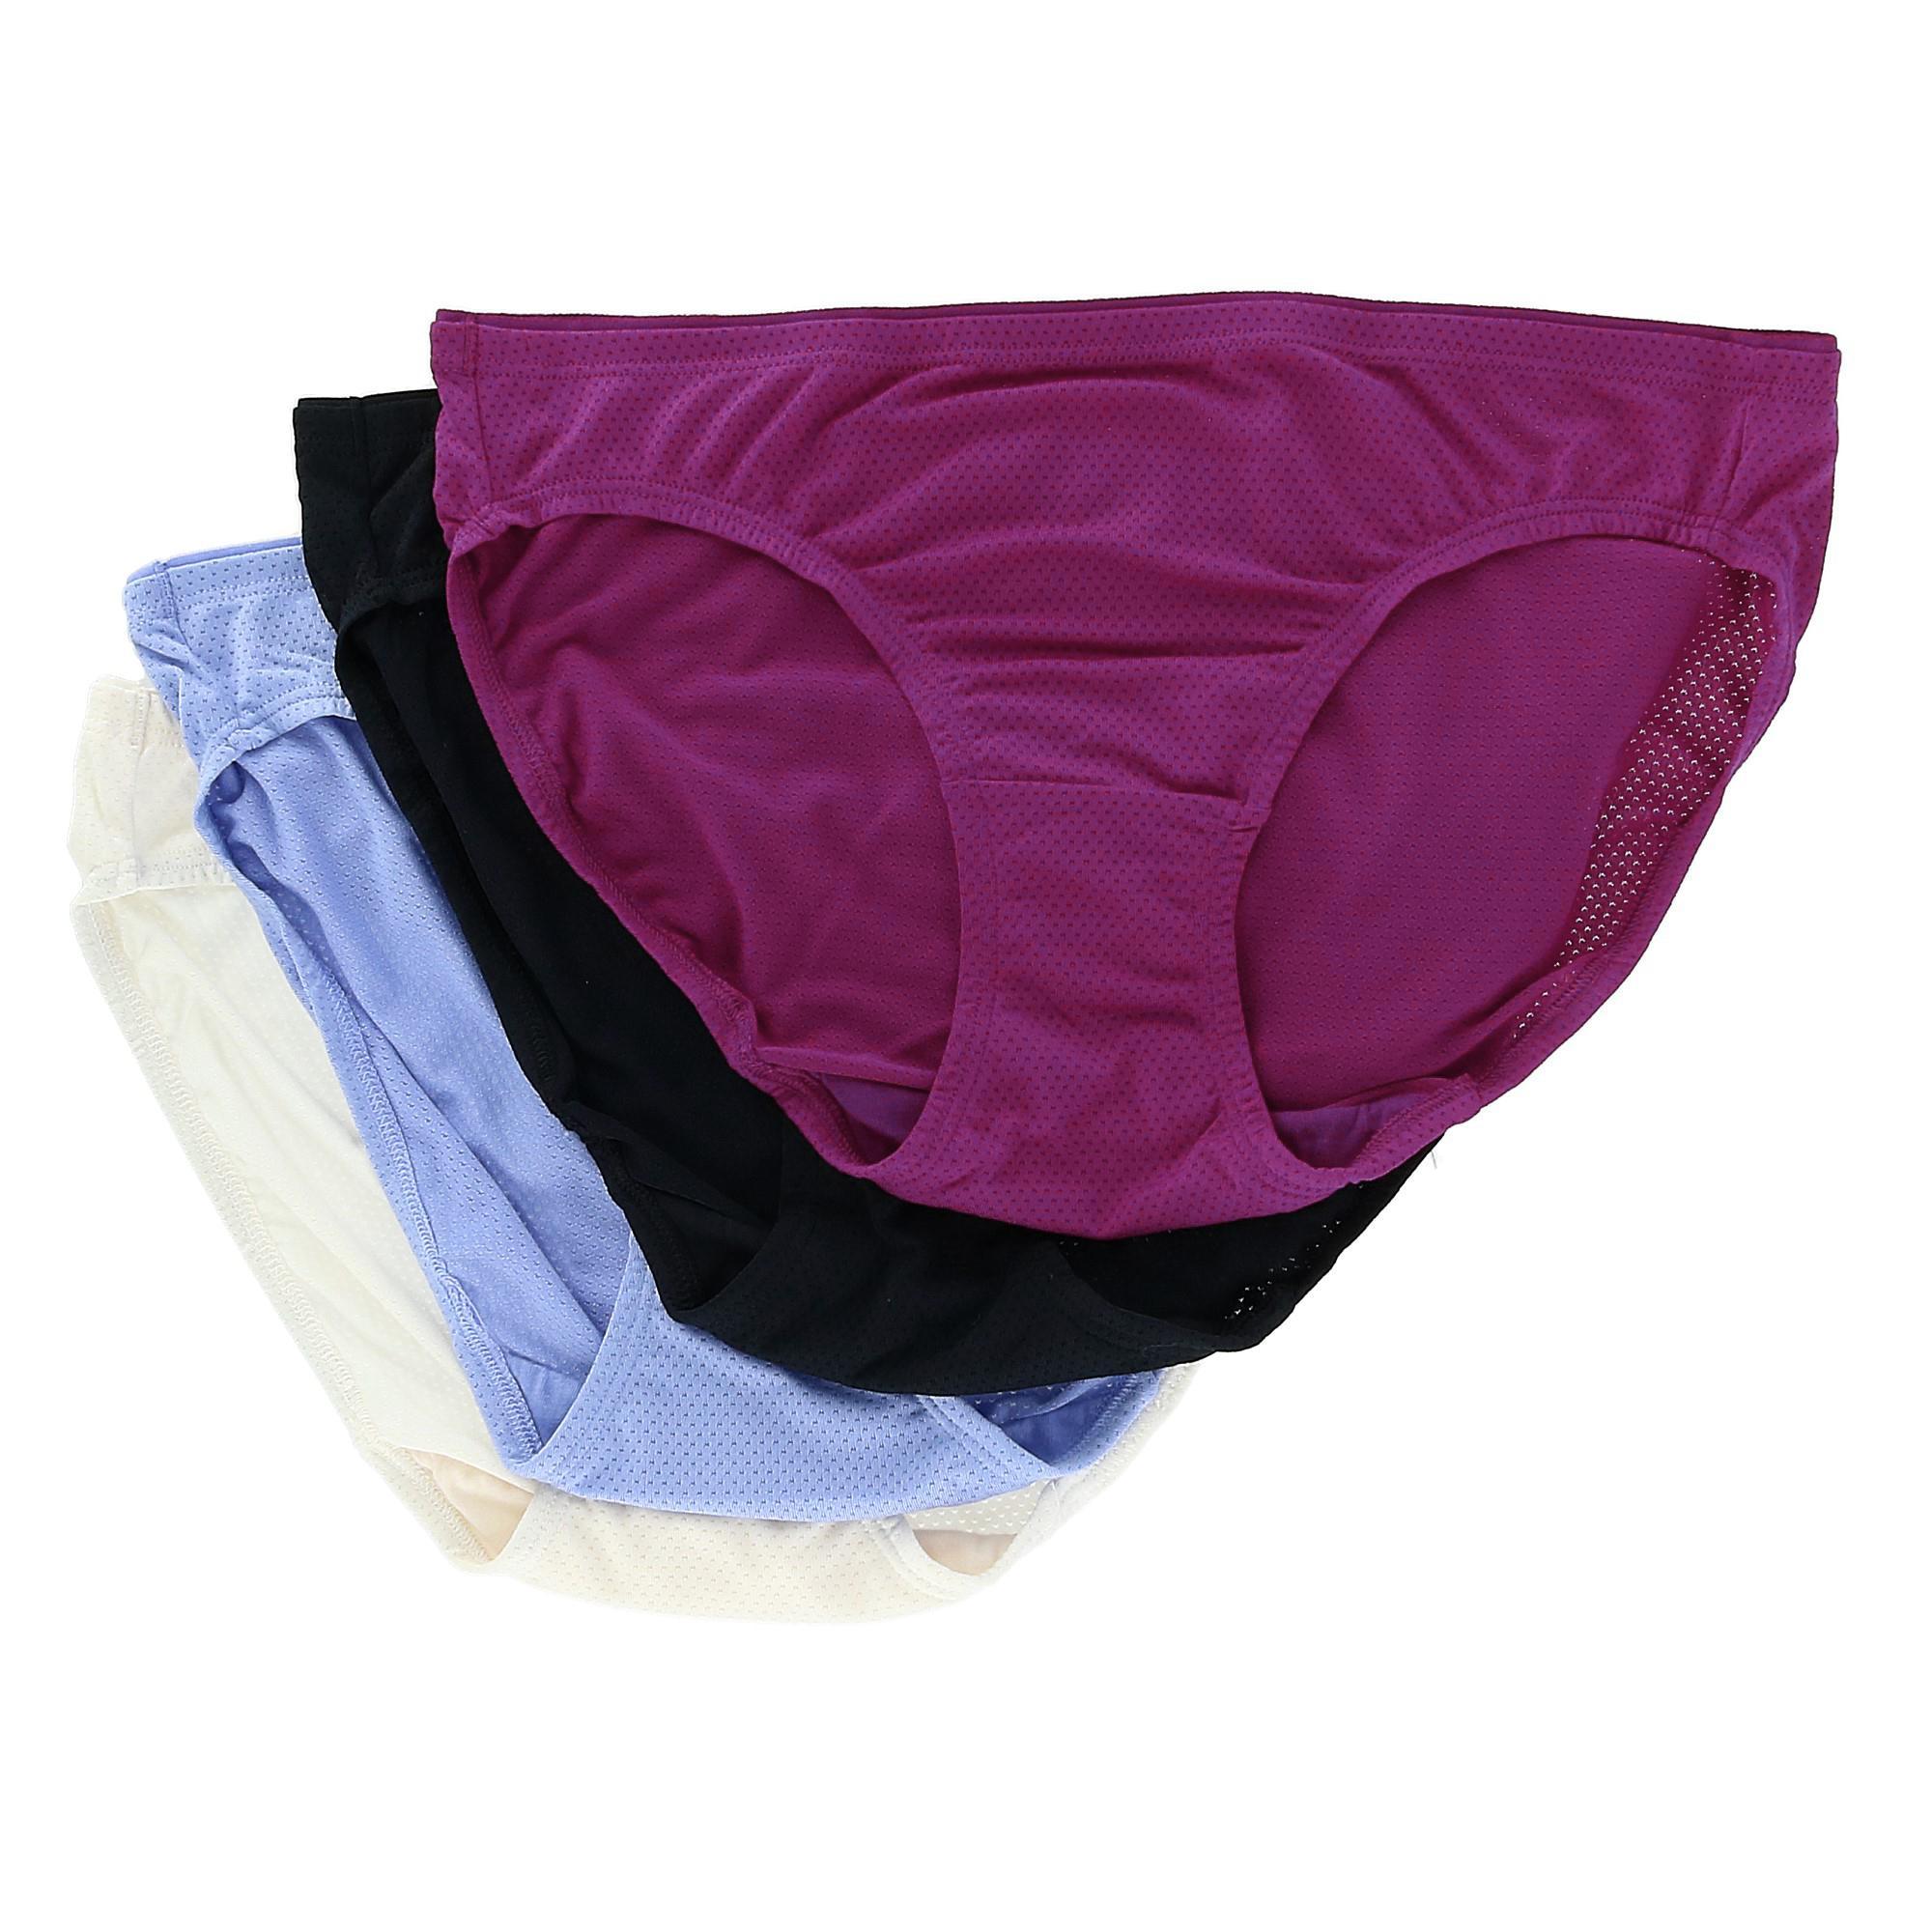 colored-mens-fruity-loom-bikini-underwear